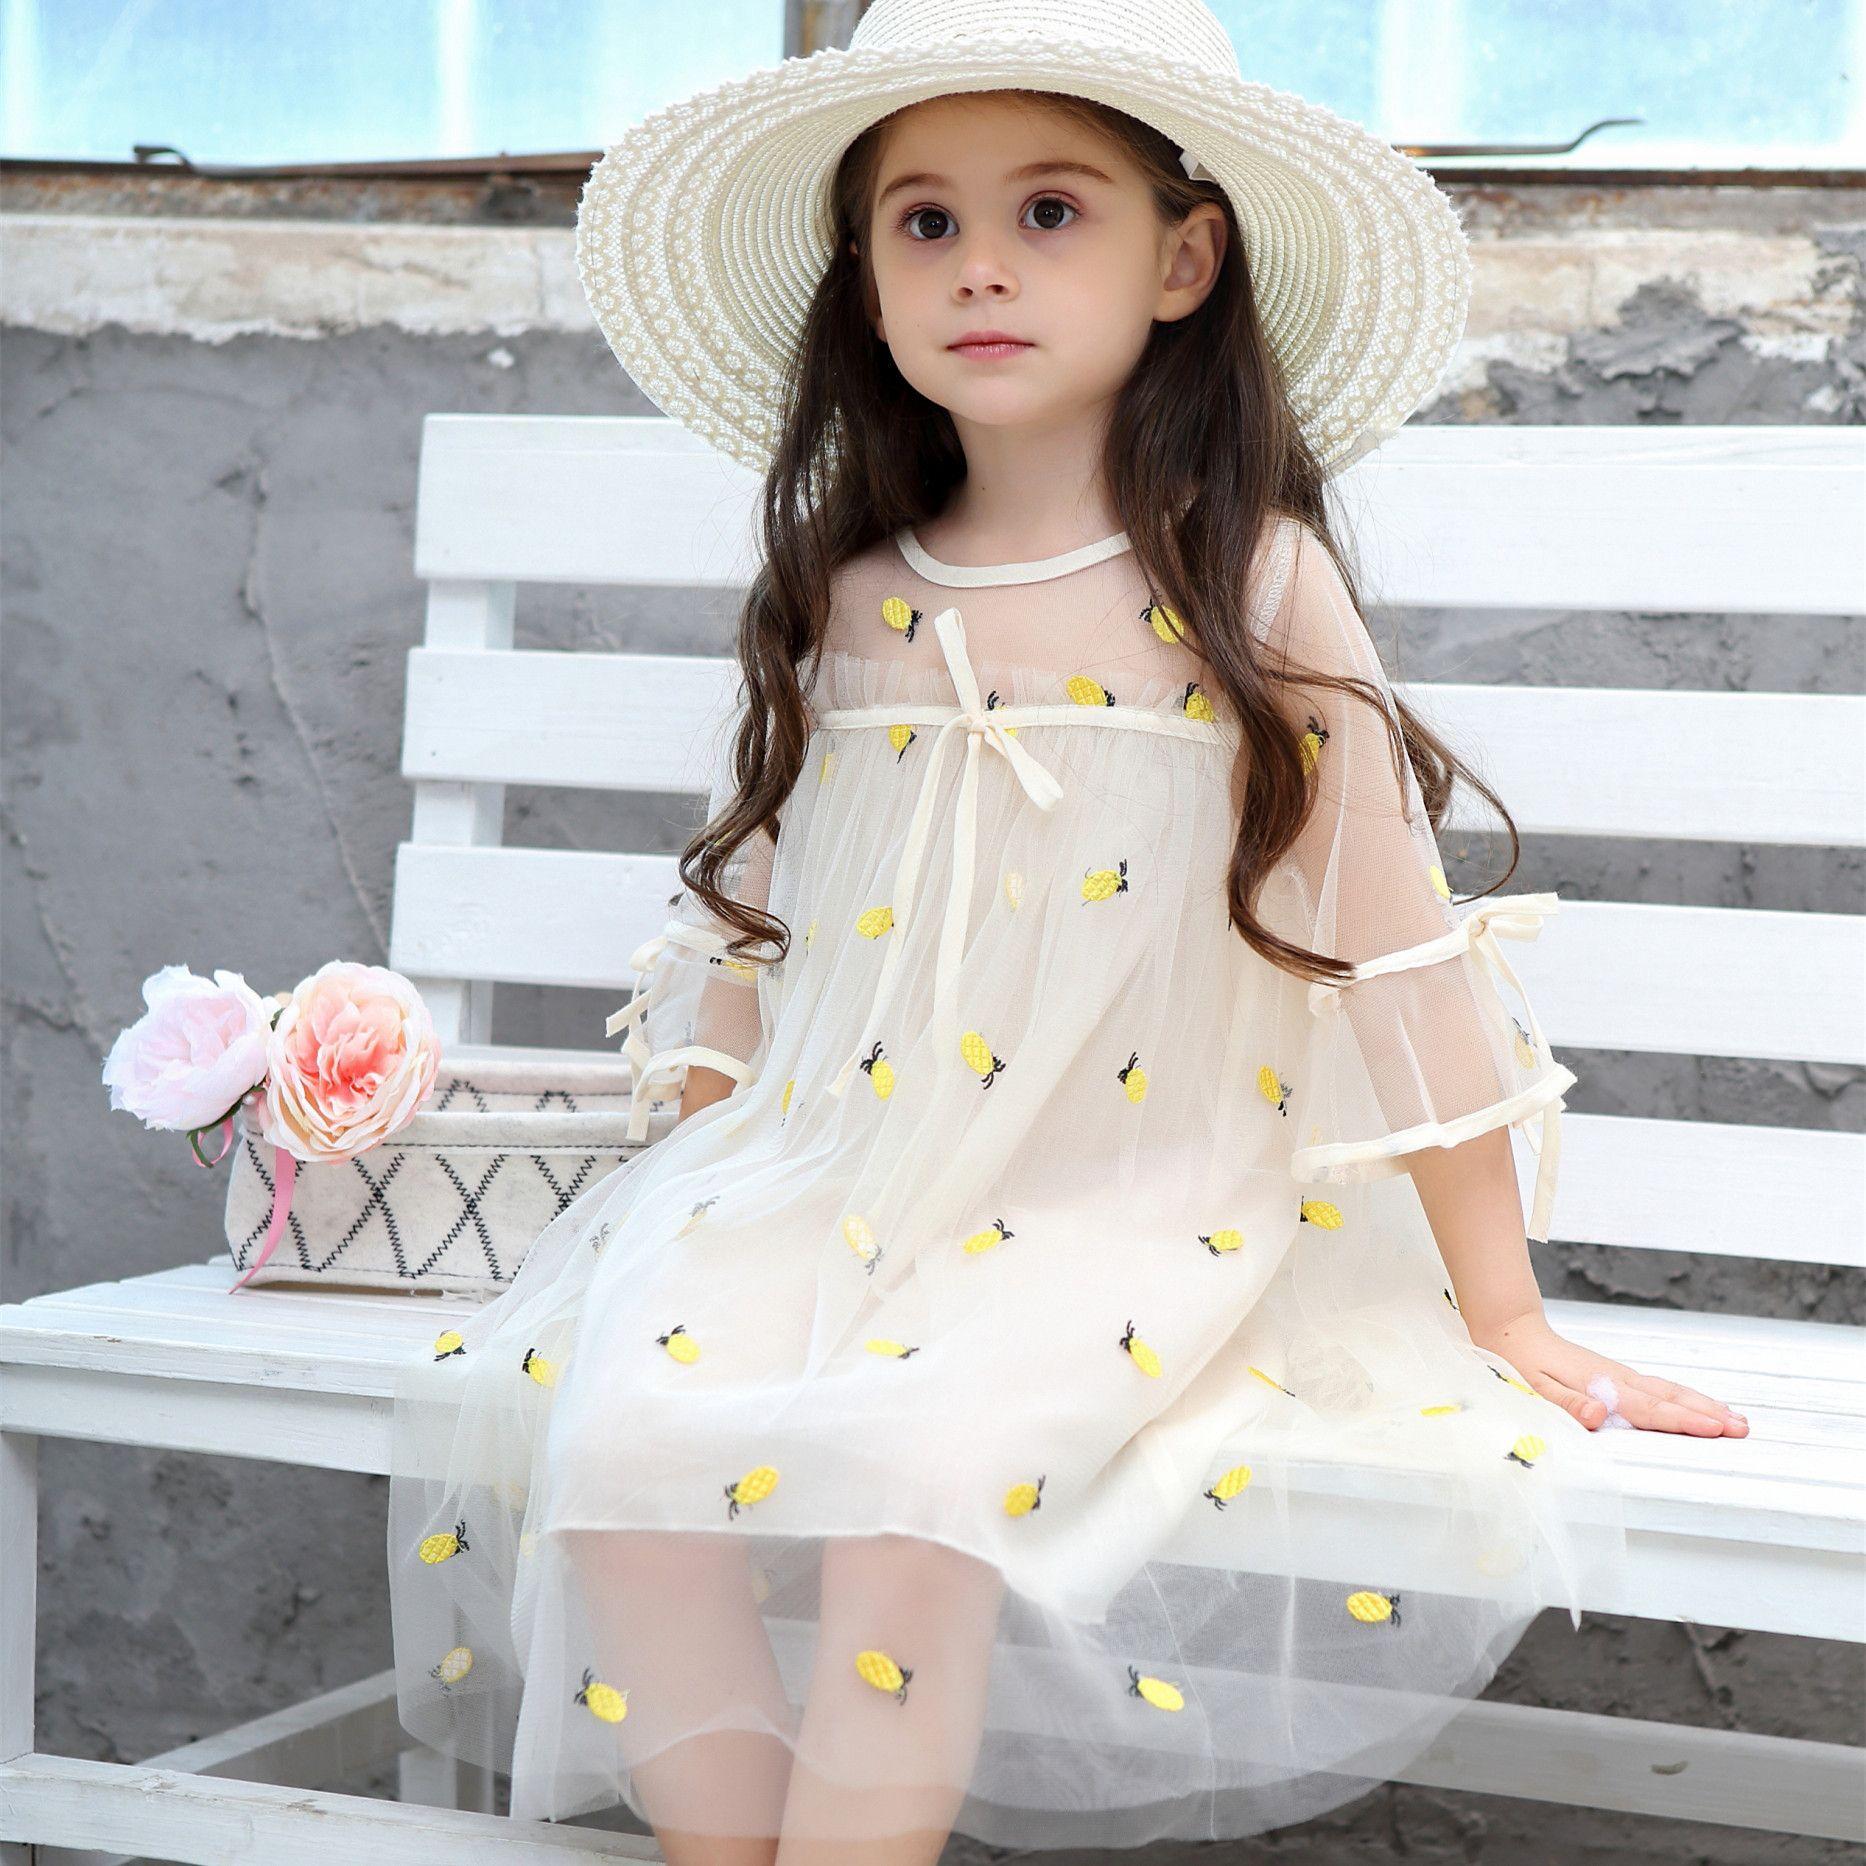 Oklady 2019 Girls Summer Hot Princess Elegante Encaje Piña Fiesta Dulce Cute Kid Girl Vestido de Malla Blanca Para 6t J190614